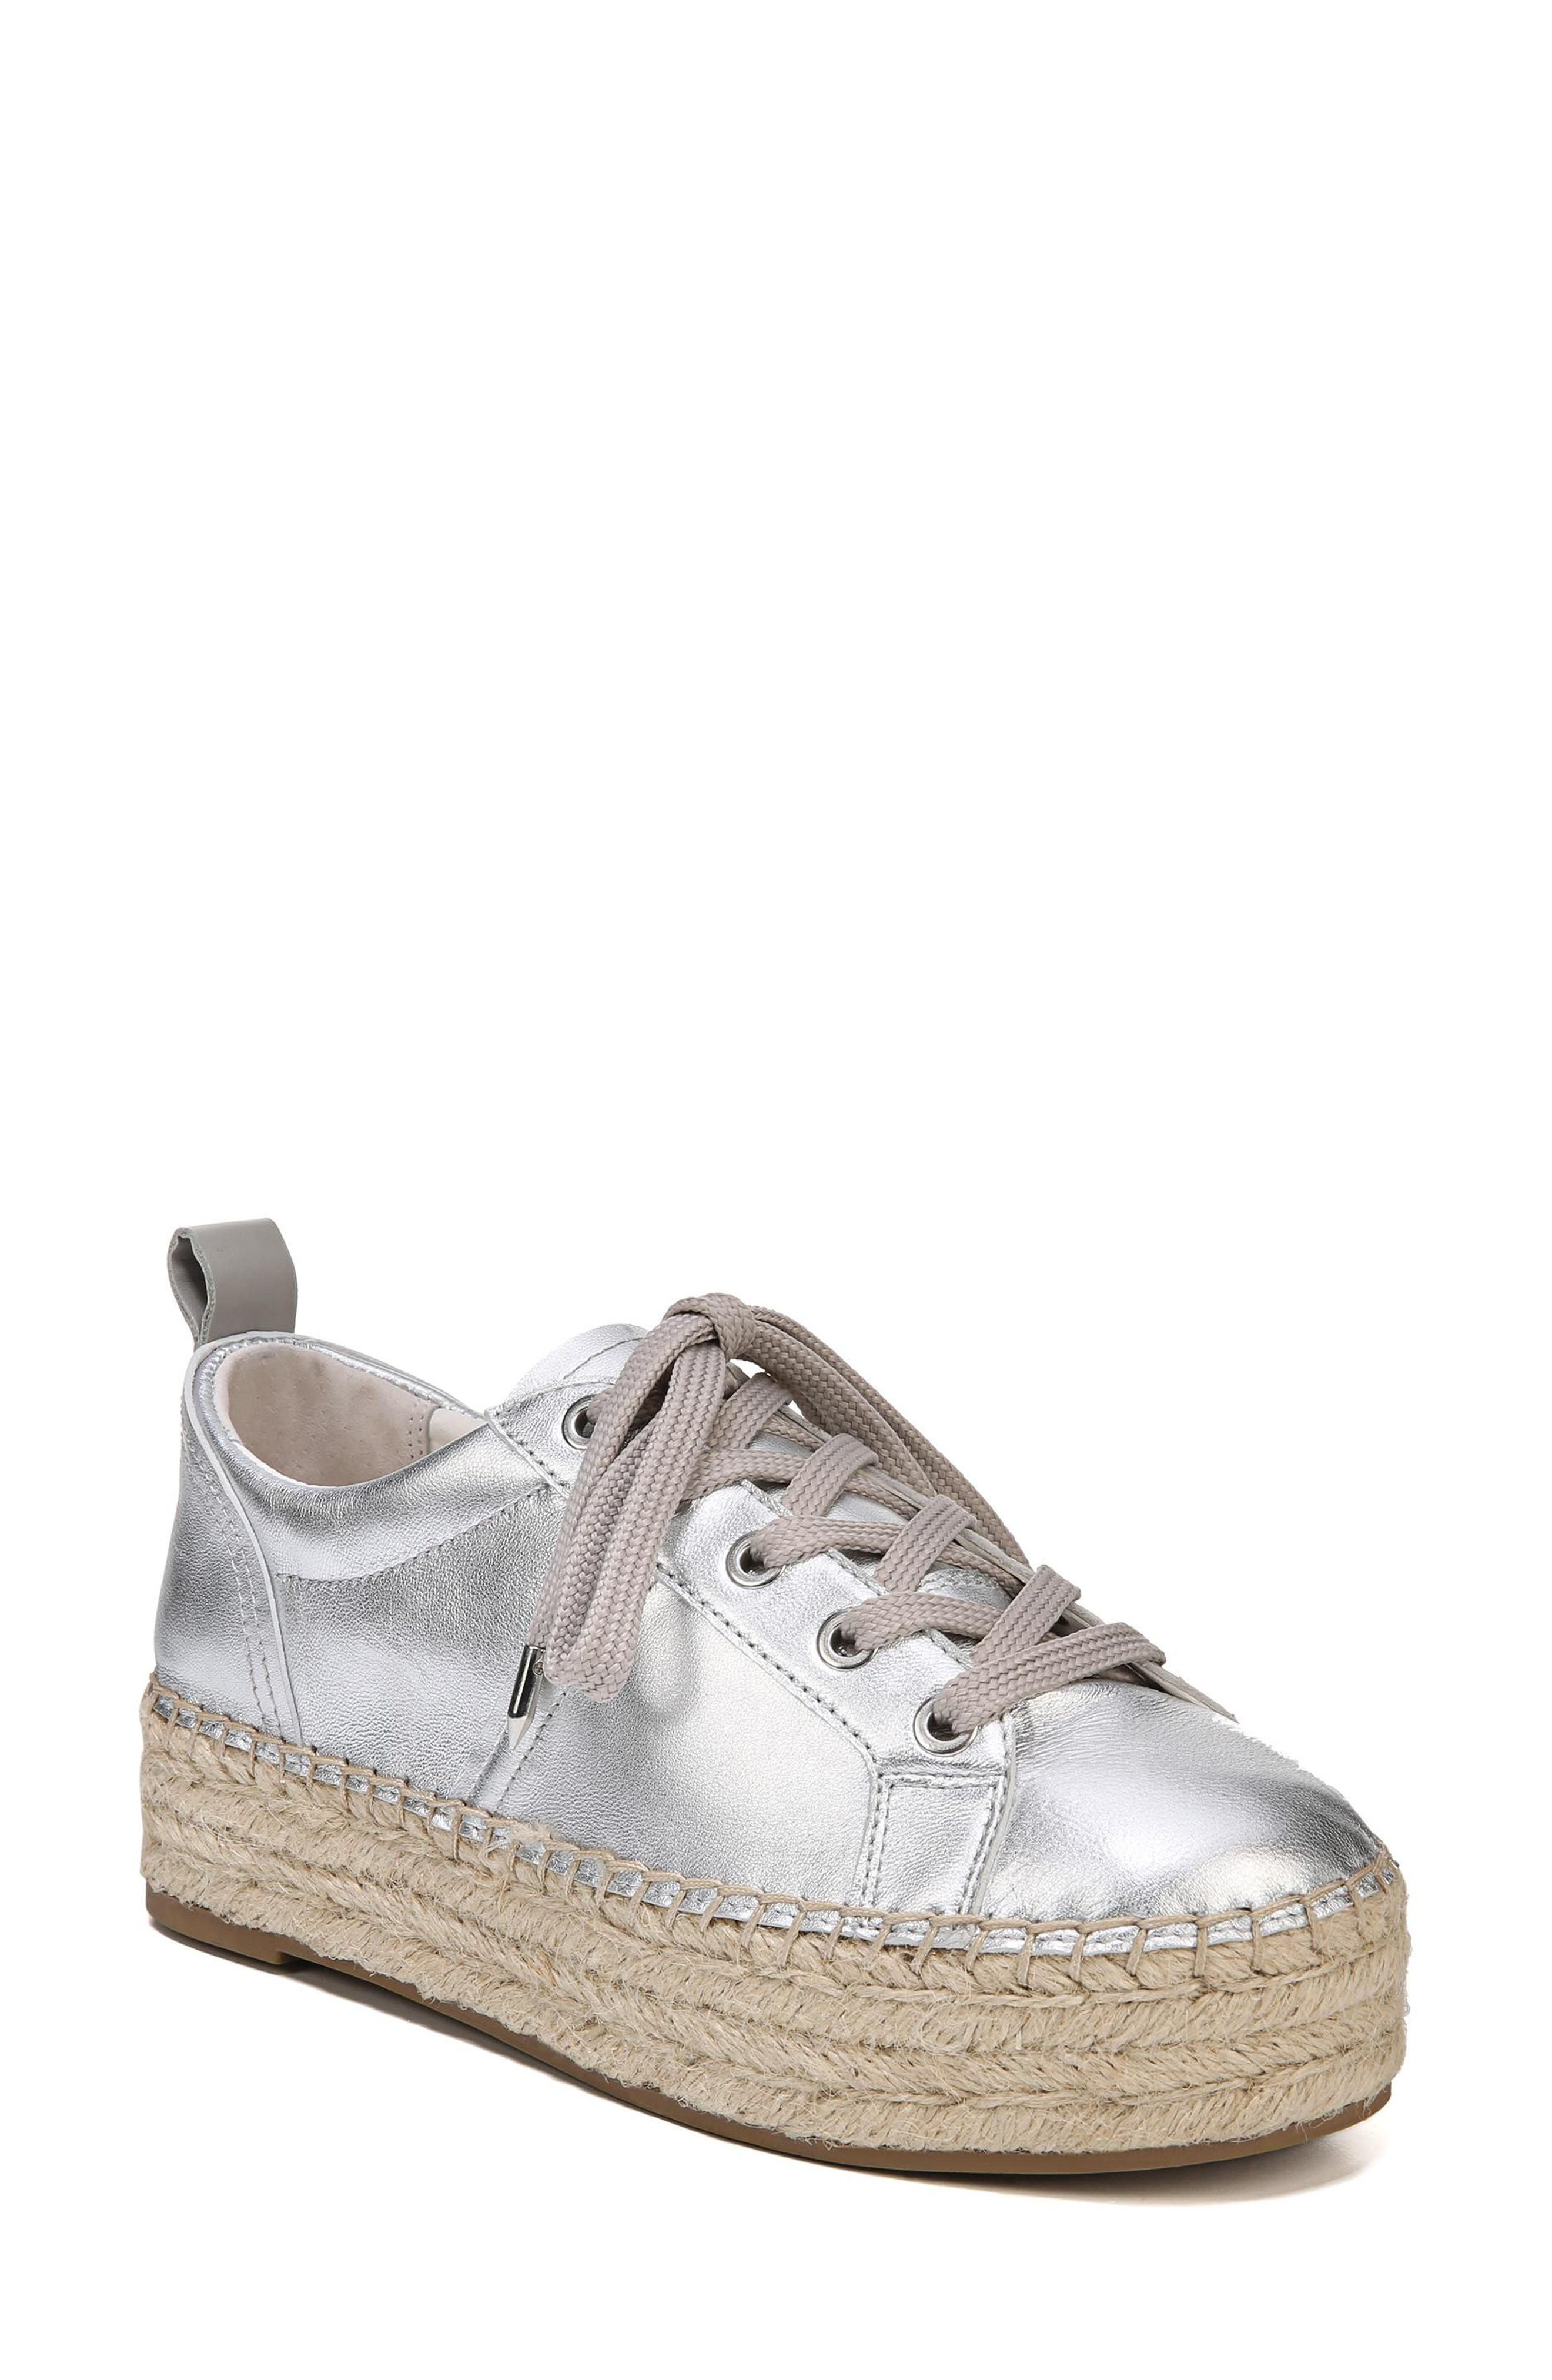 Carleigh Espadrille Sneaker,                         Main,                         color, 040